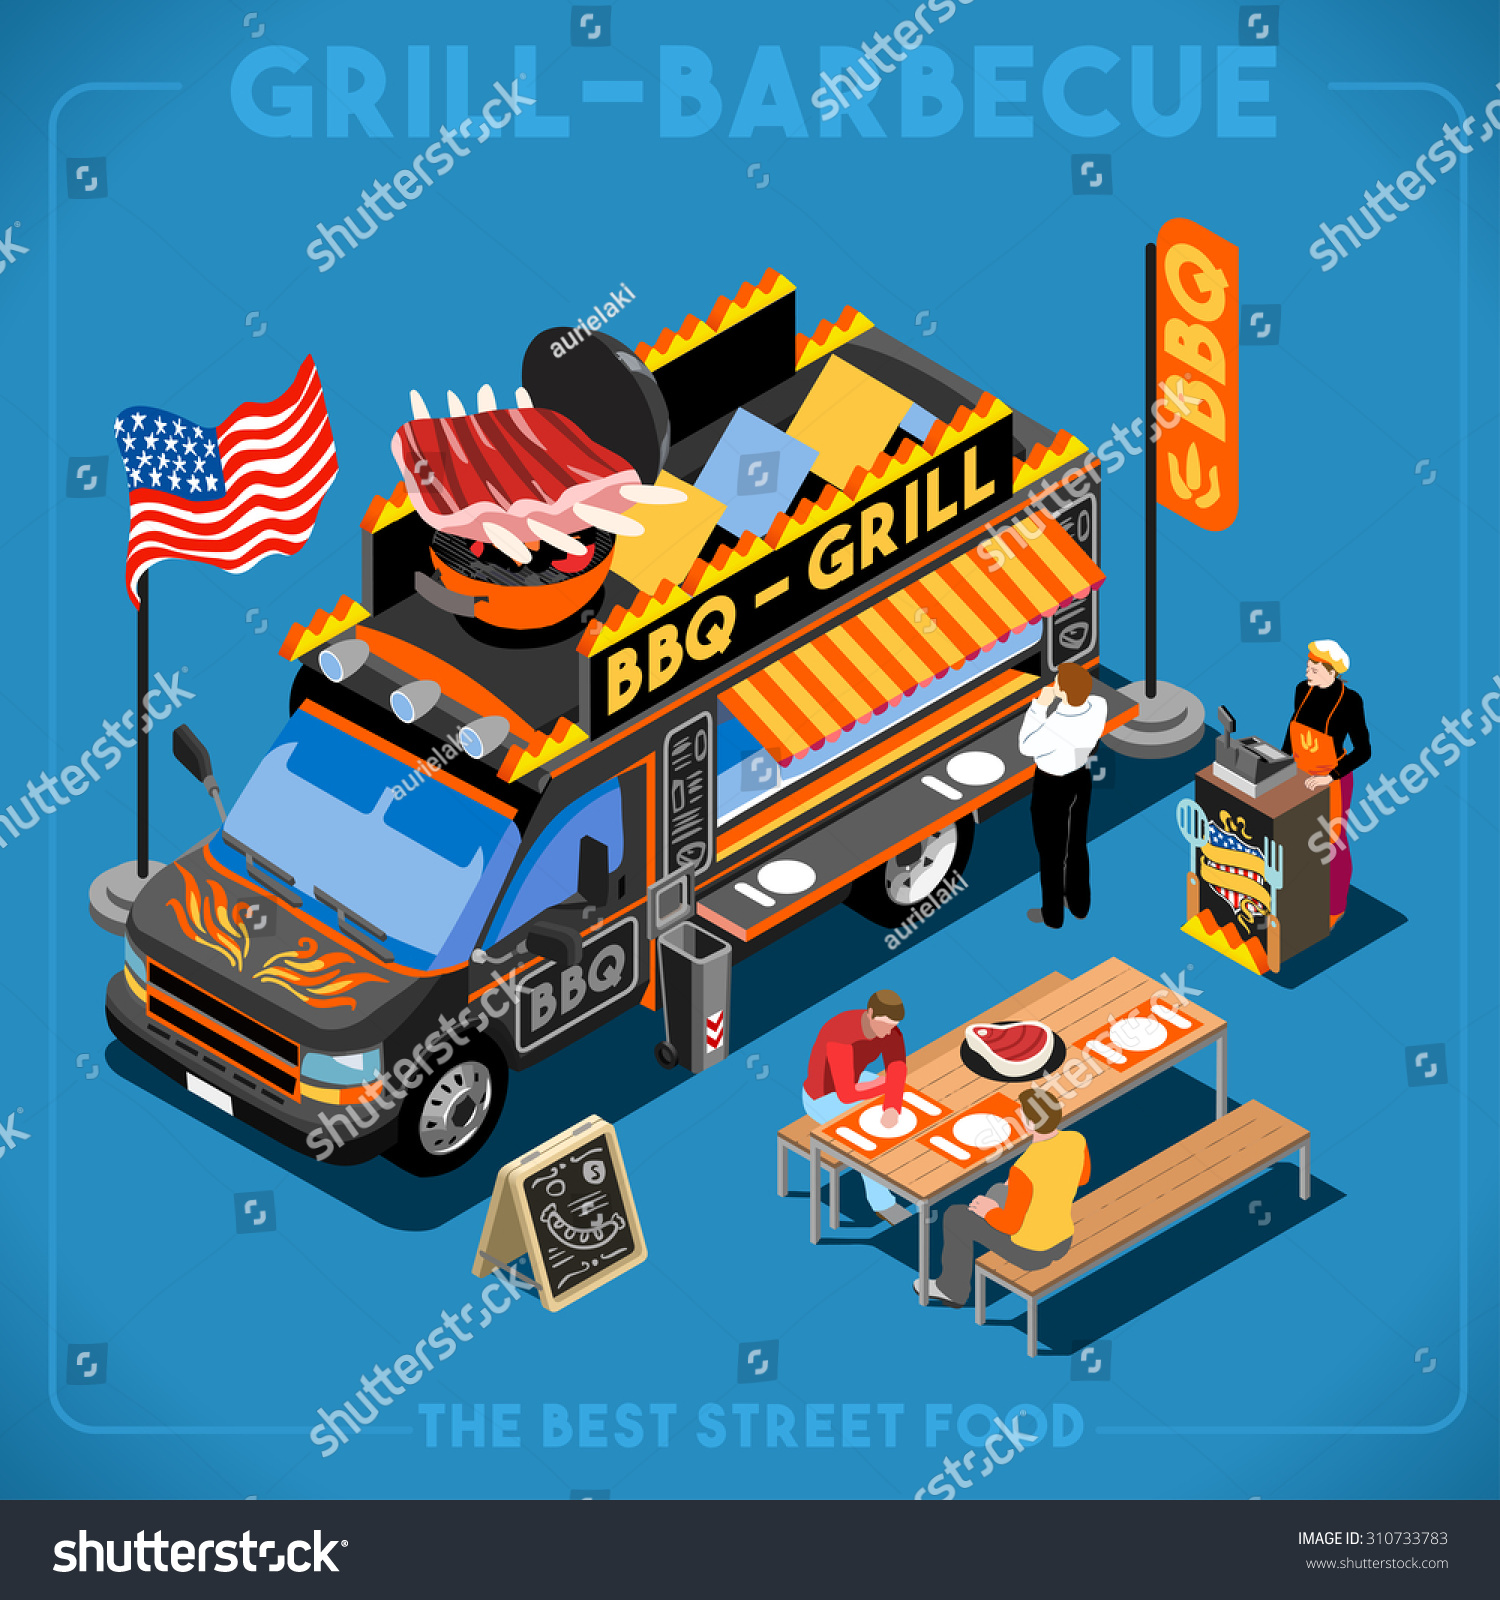 Latin Passion Food Truck